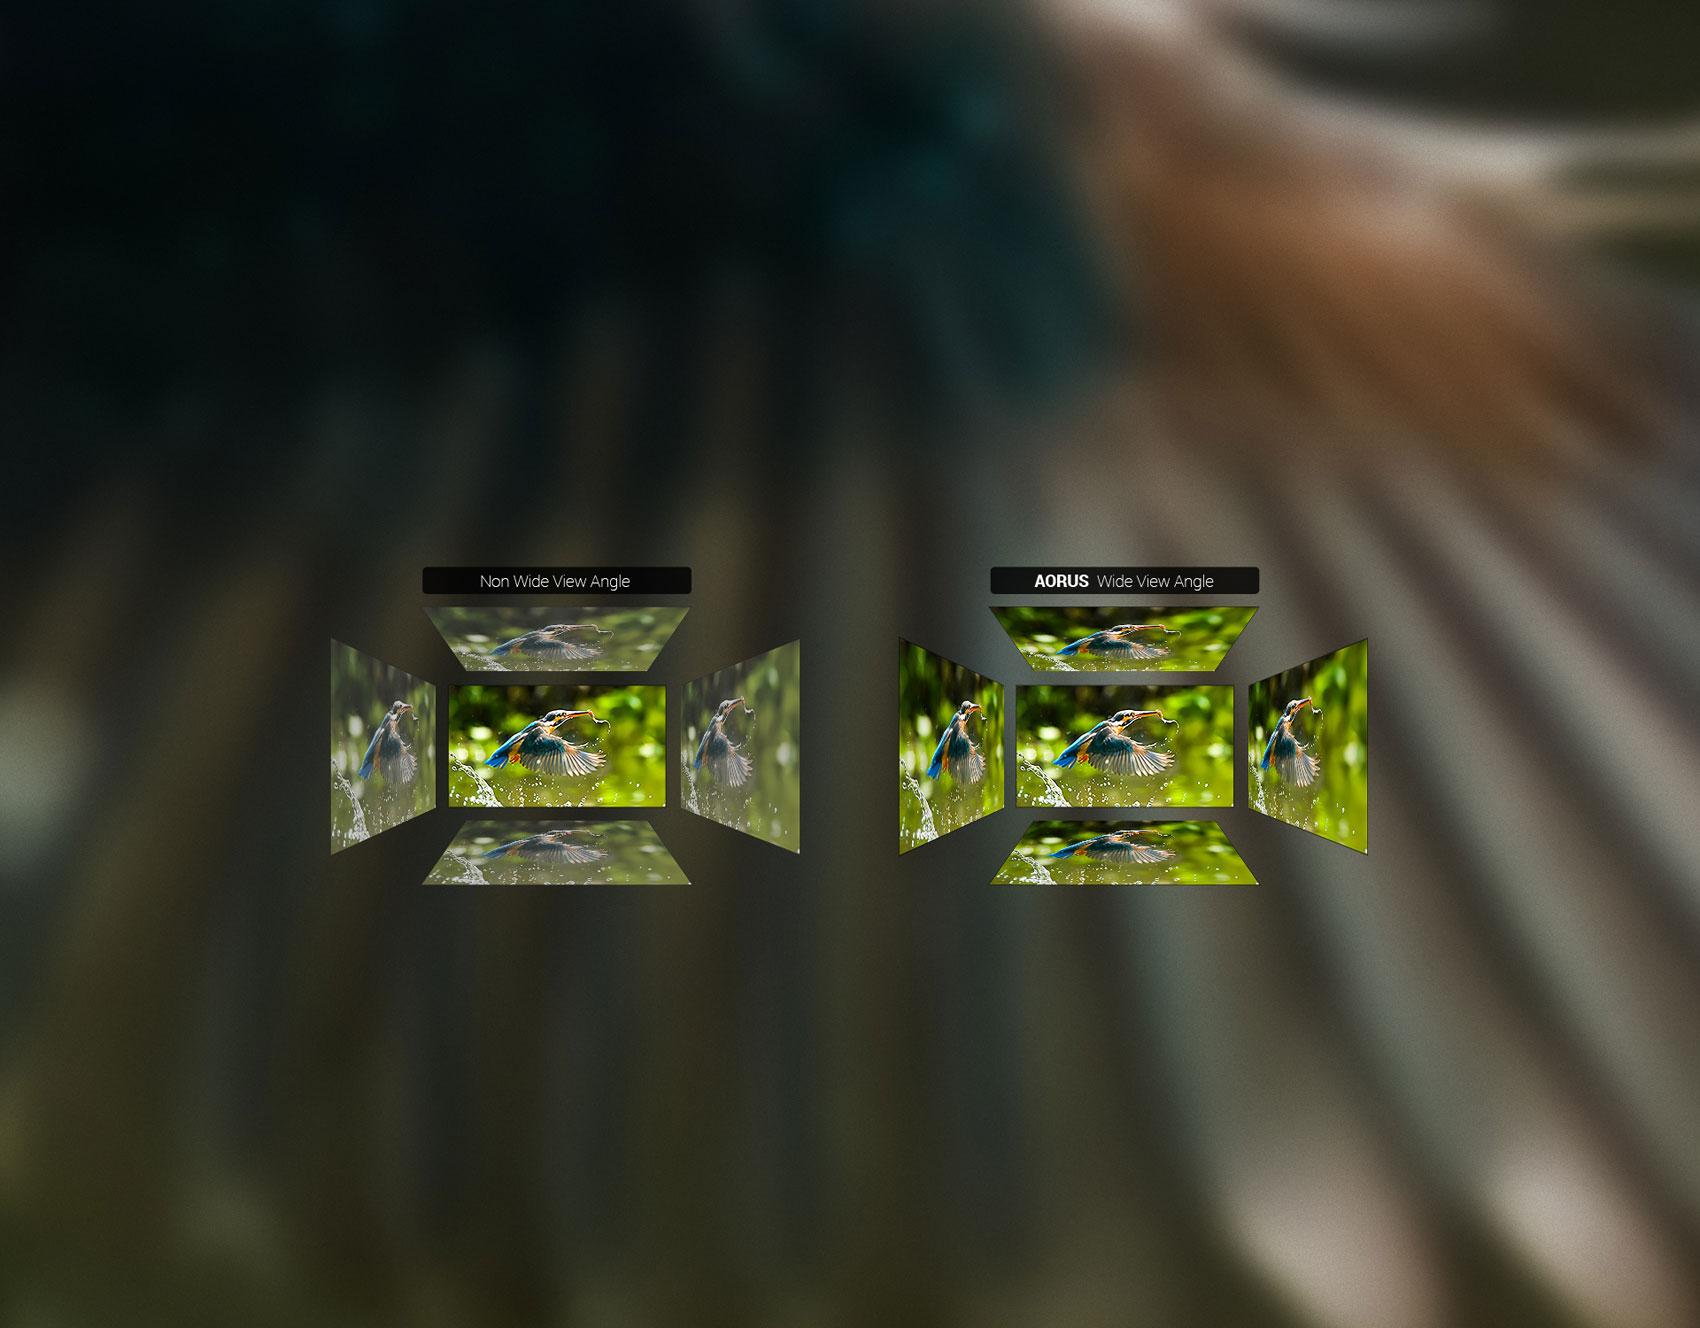 https://www.aorus.com/product_html/120/X3Plusv7/images/wideview-bg-1700.jpg